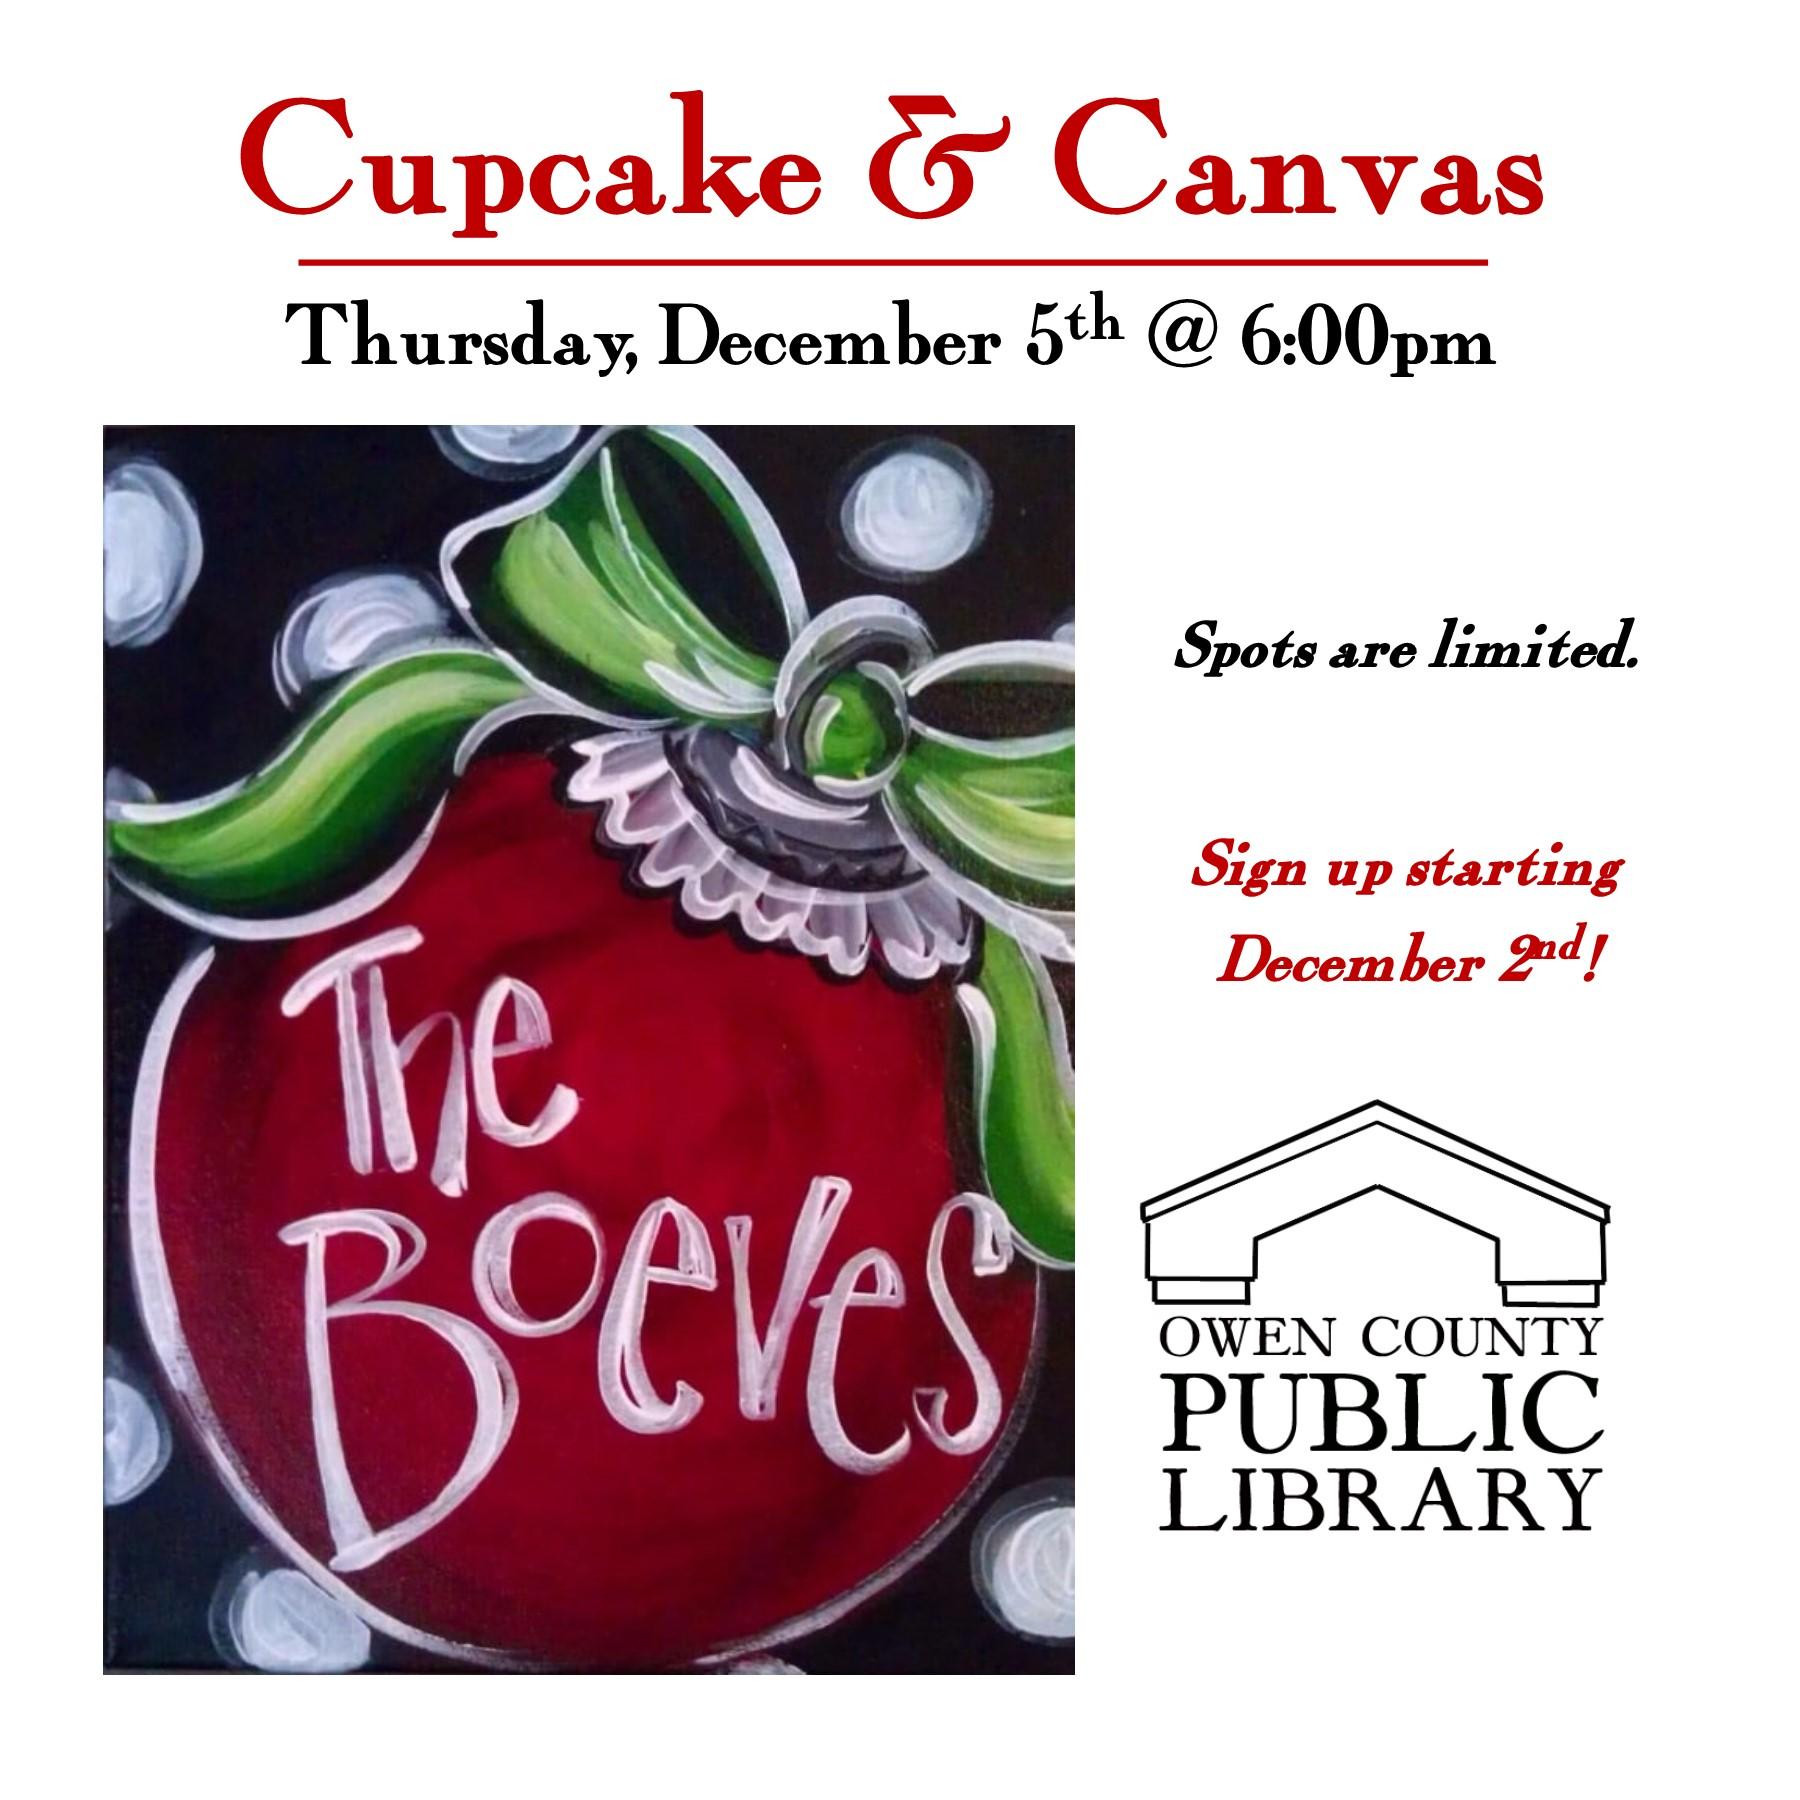 cupcake & canvas INSTAGRAM flyer, dec 5th